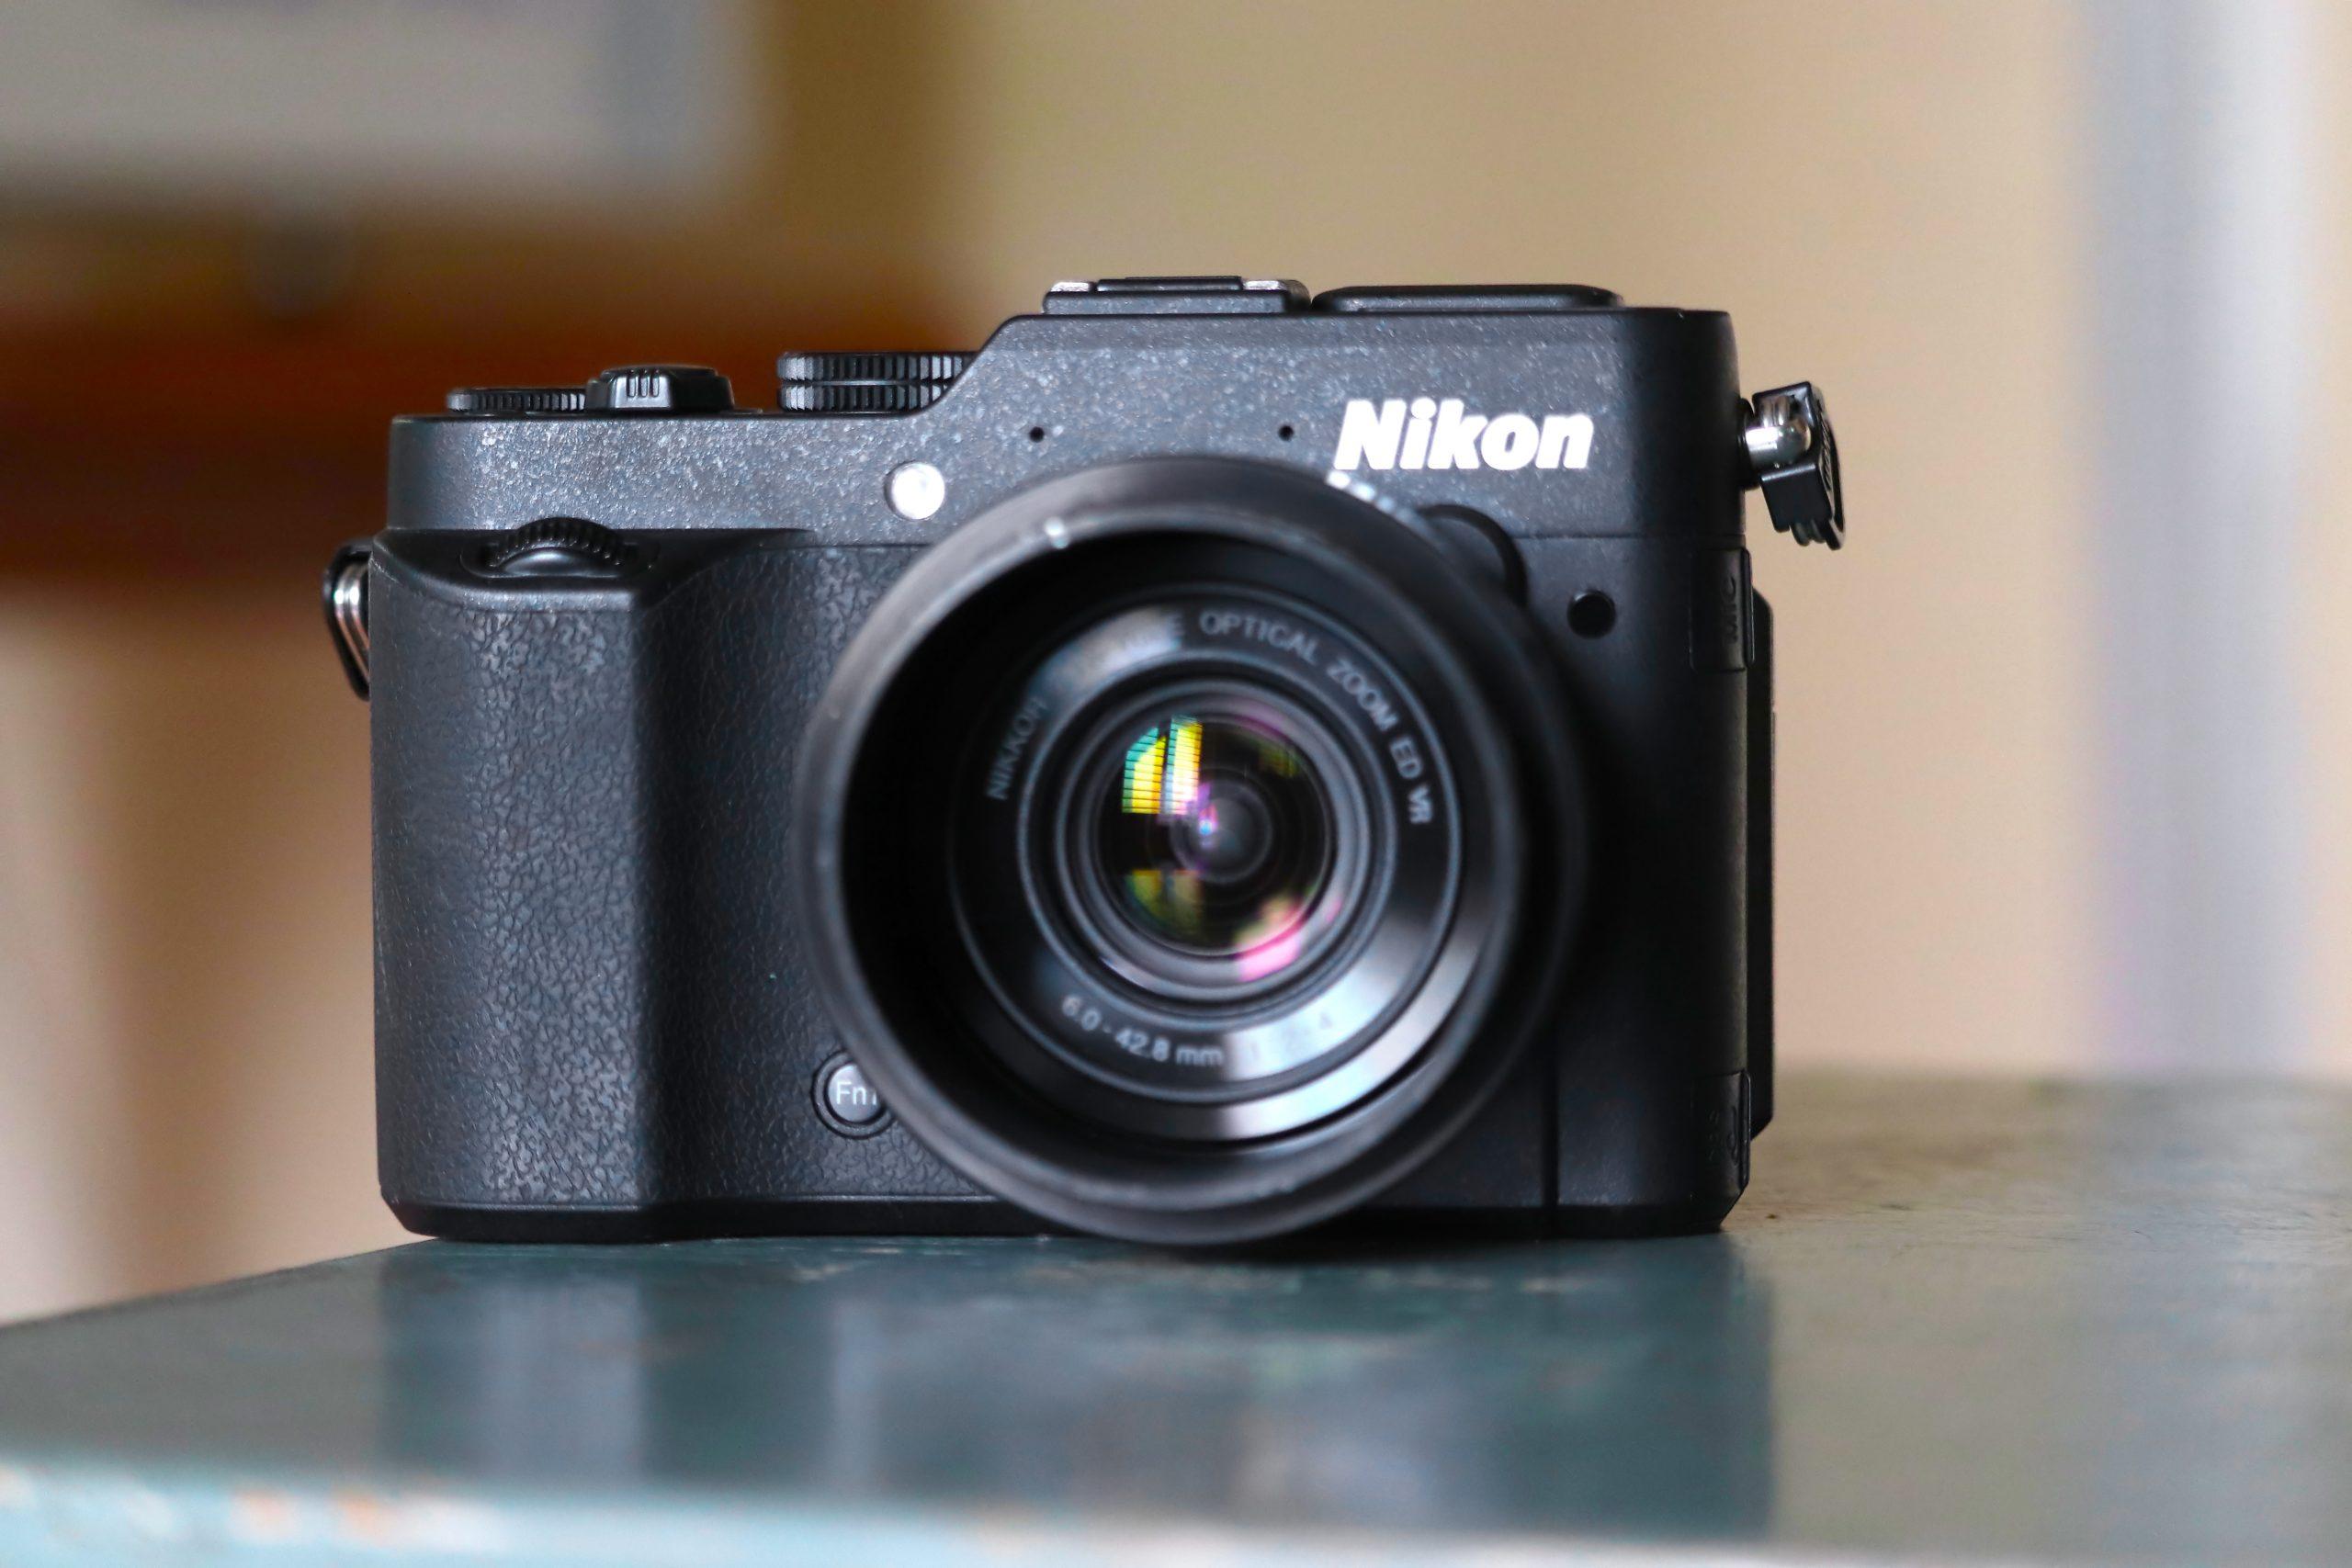 Camera captured